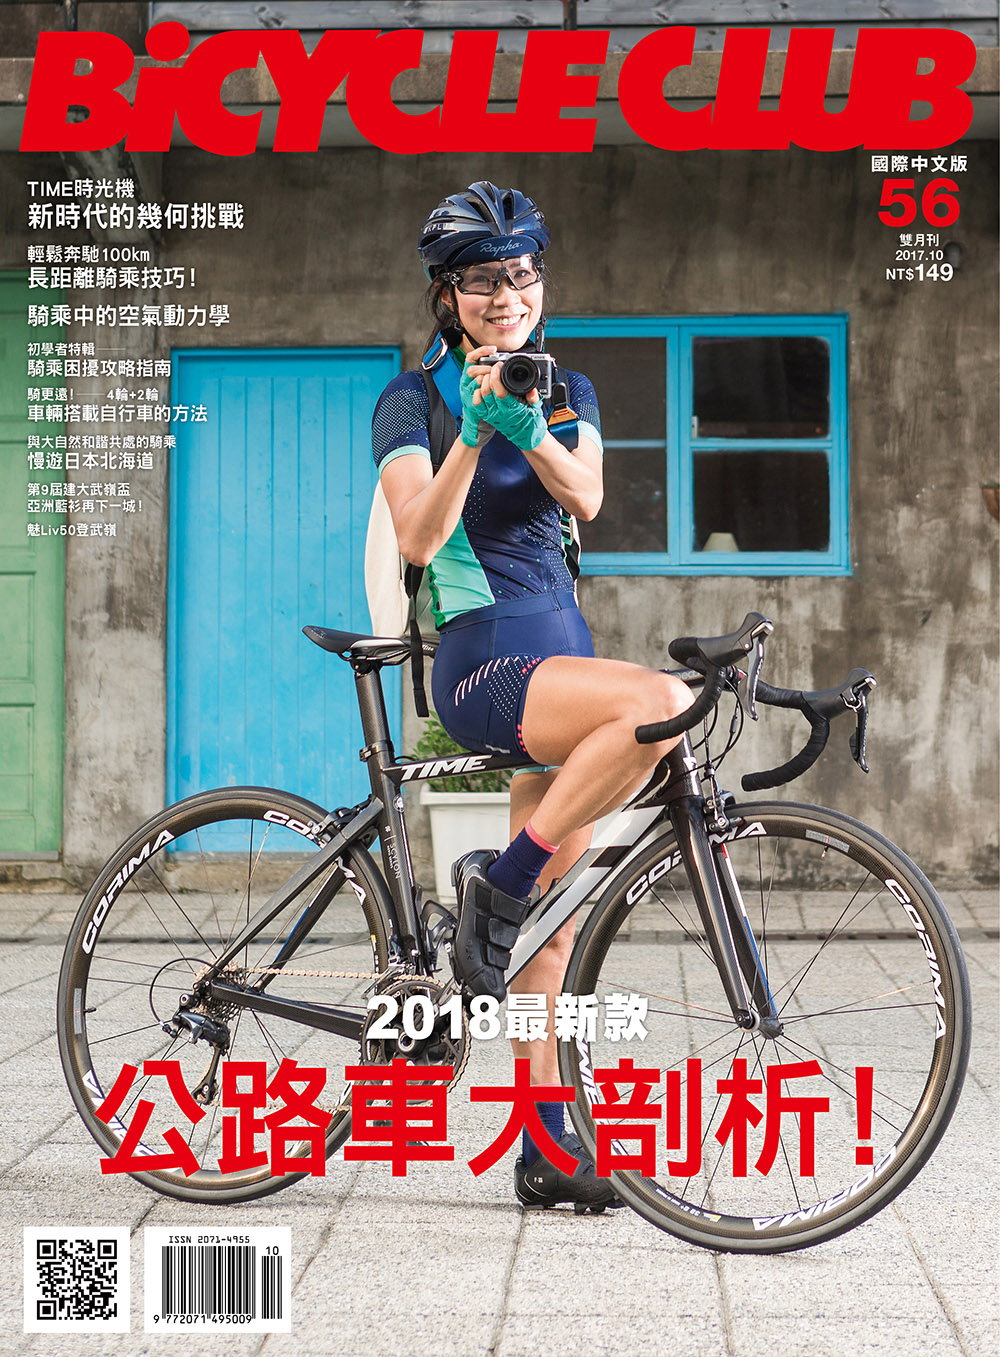 bicycle club單車俱樂部 10月號/2017第56期